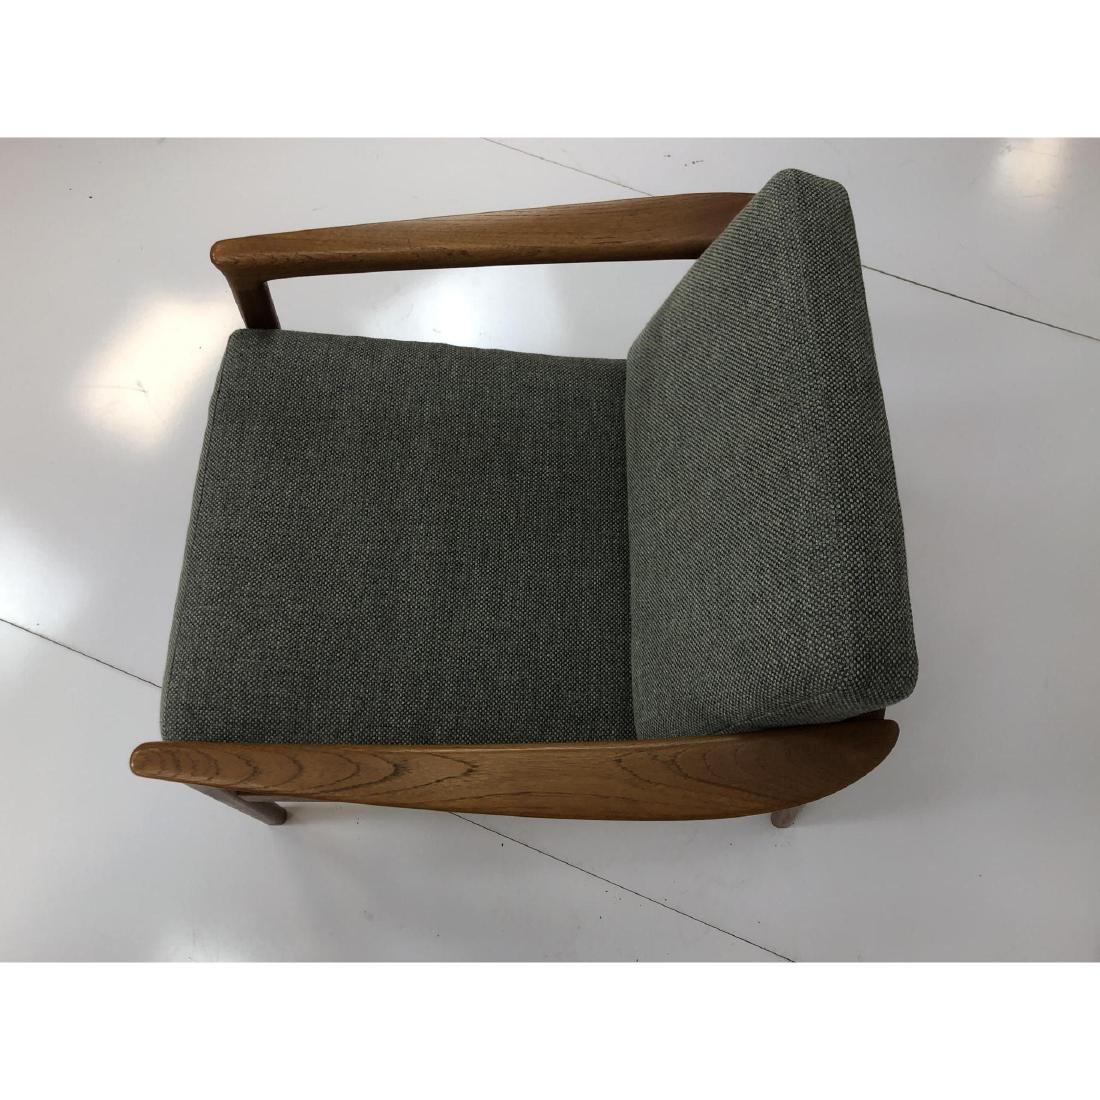 Pr FOLKE OHLSSON Danish Modern Teak Lounge Chairs - 7